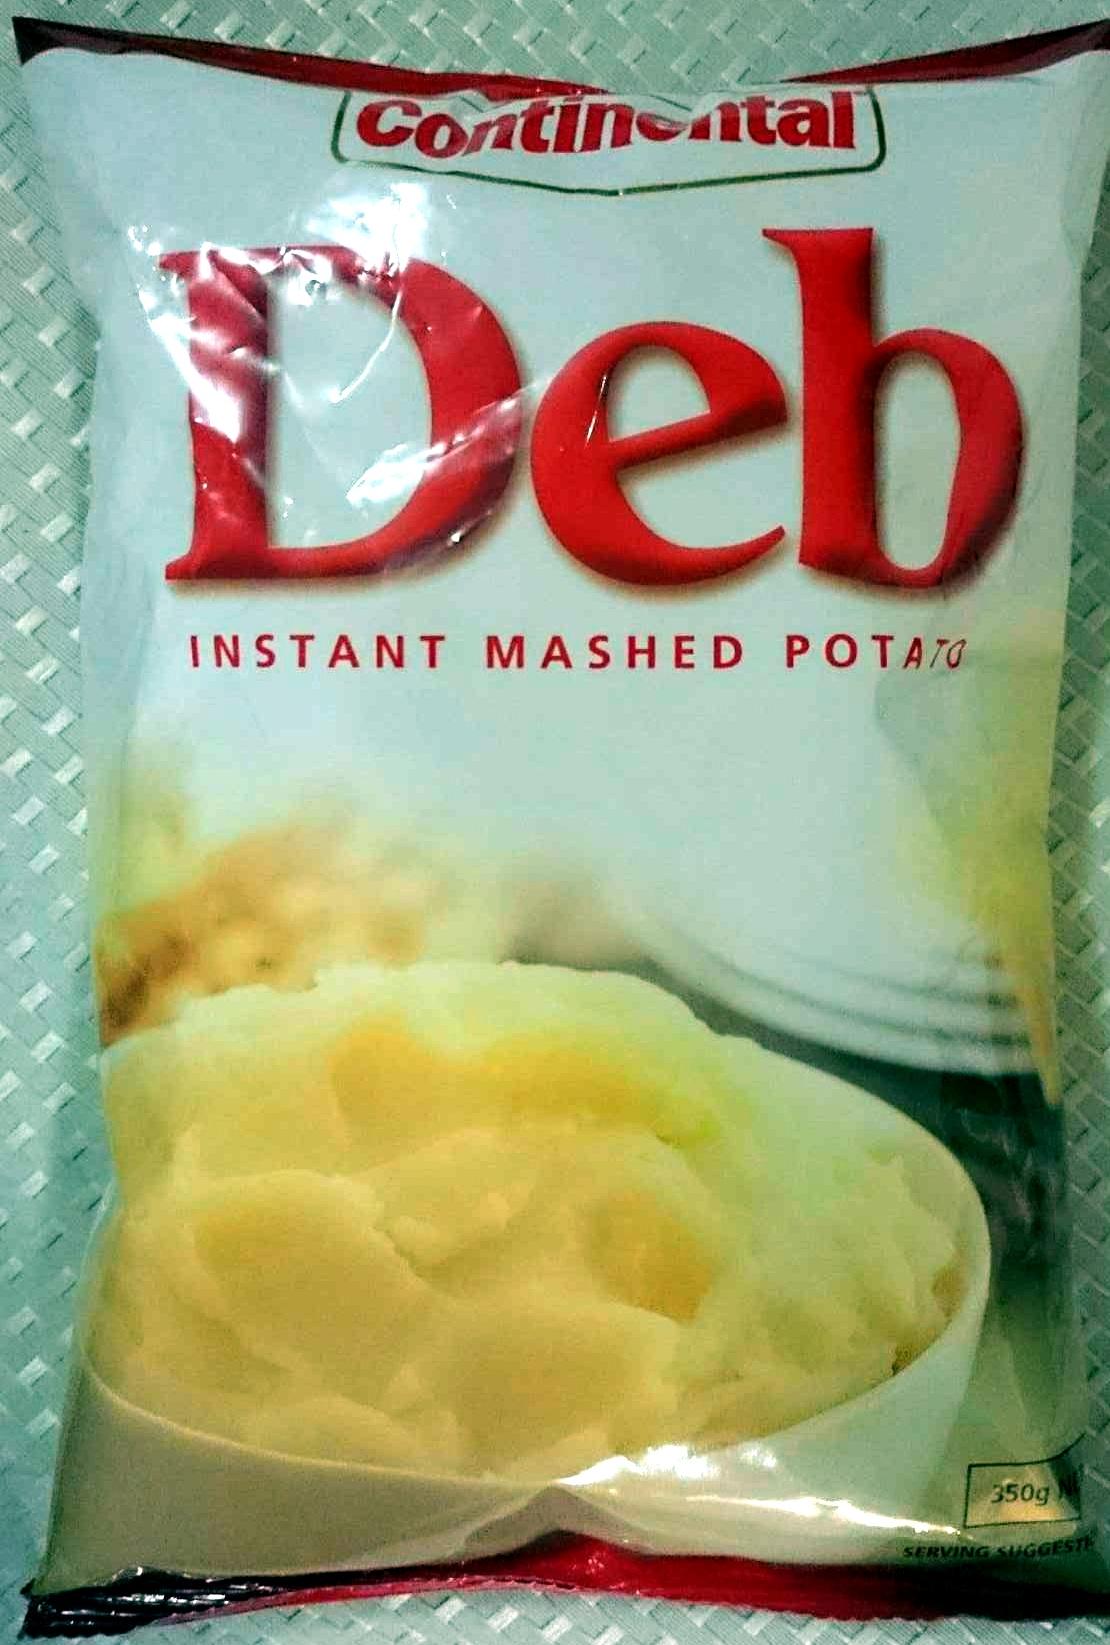 Deb Instant Mashed Potato - Product - en